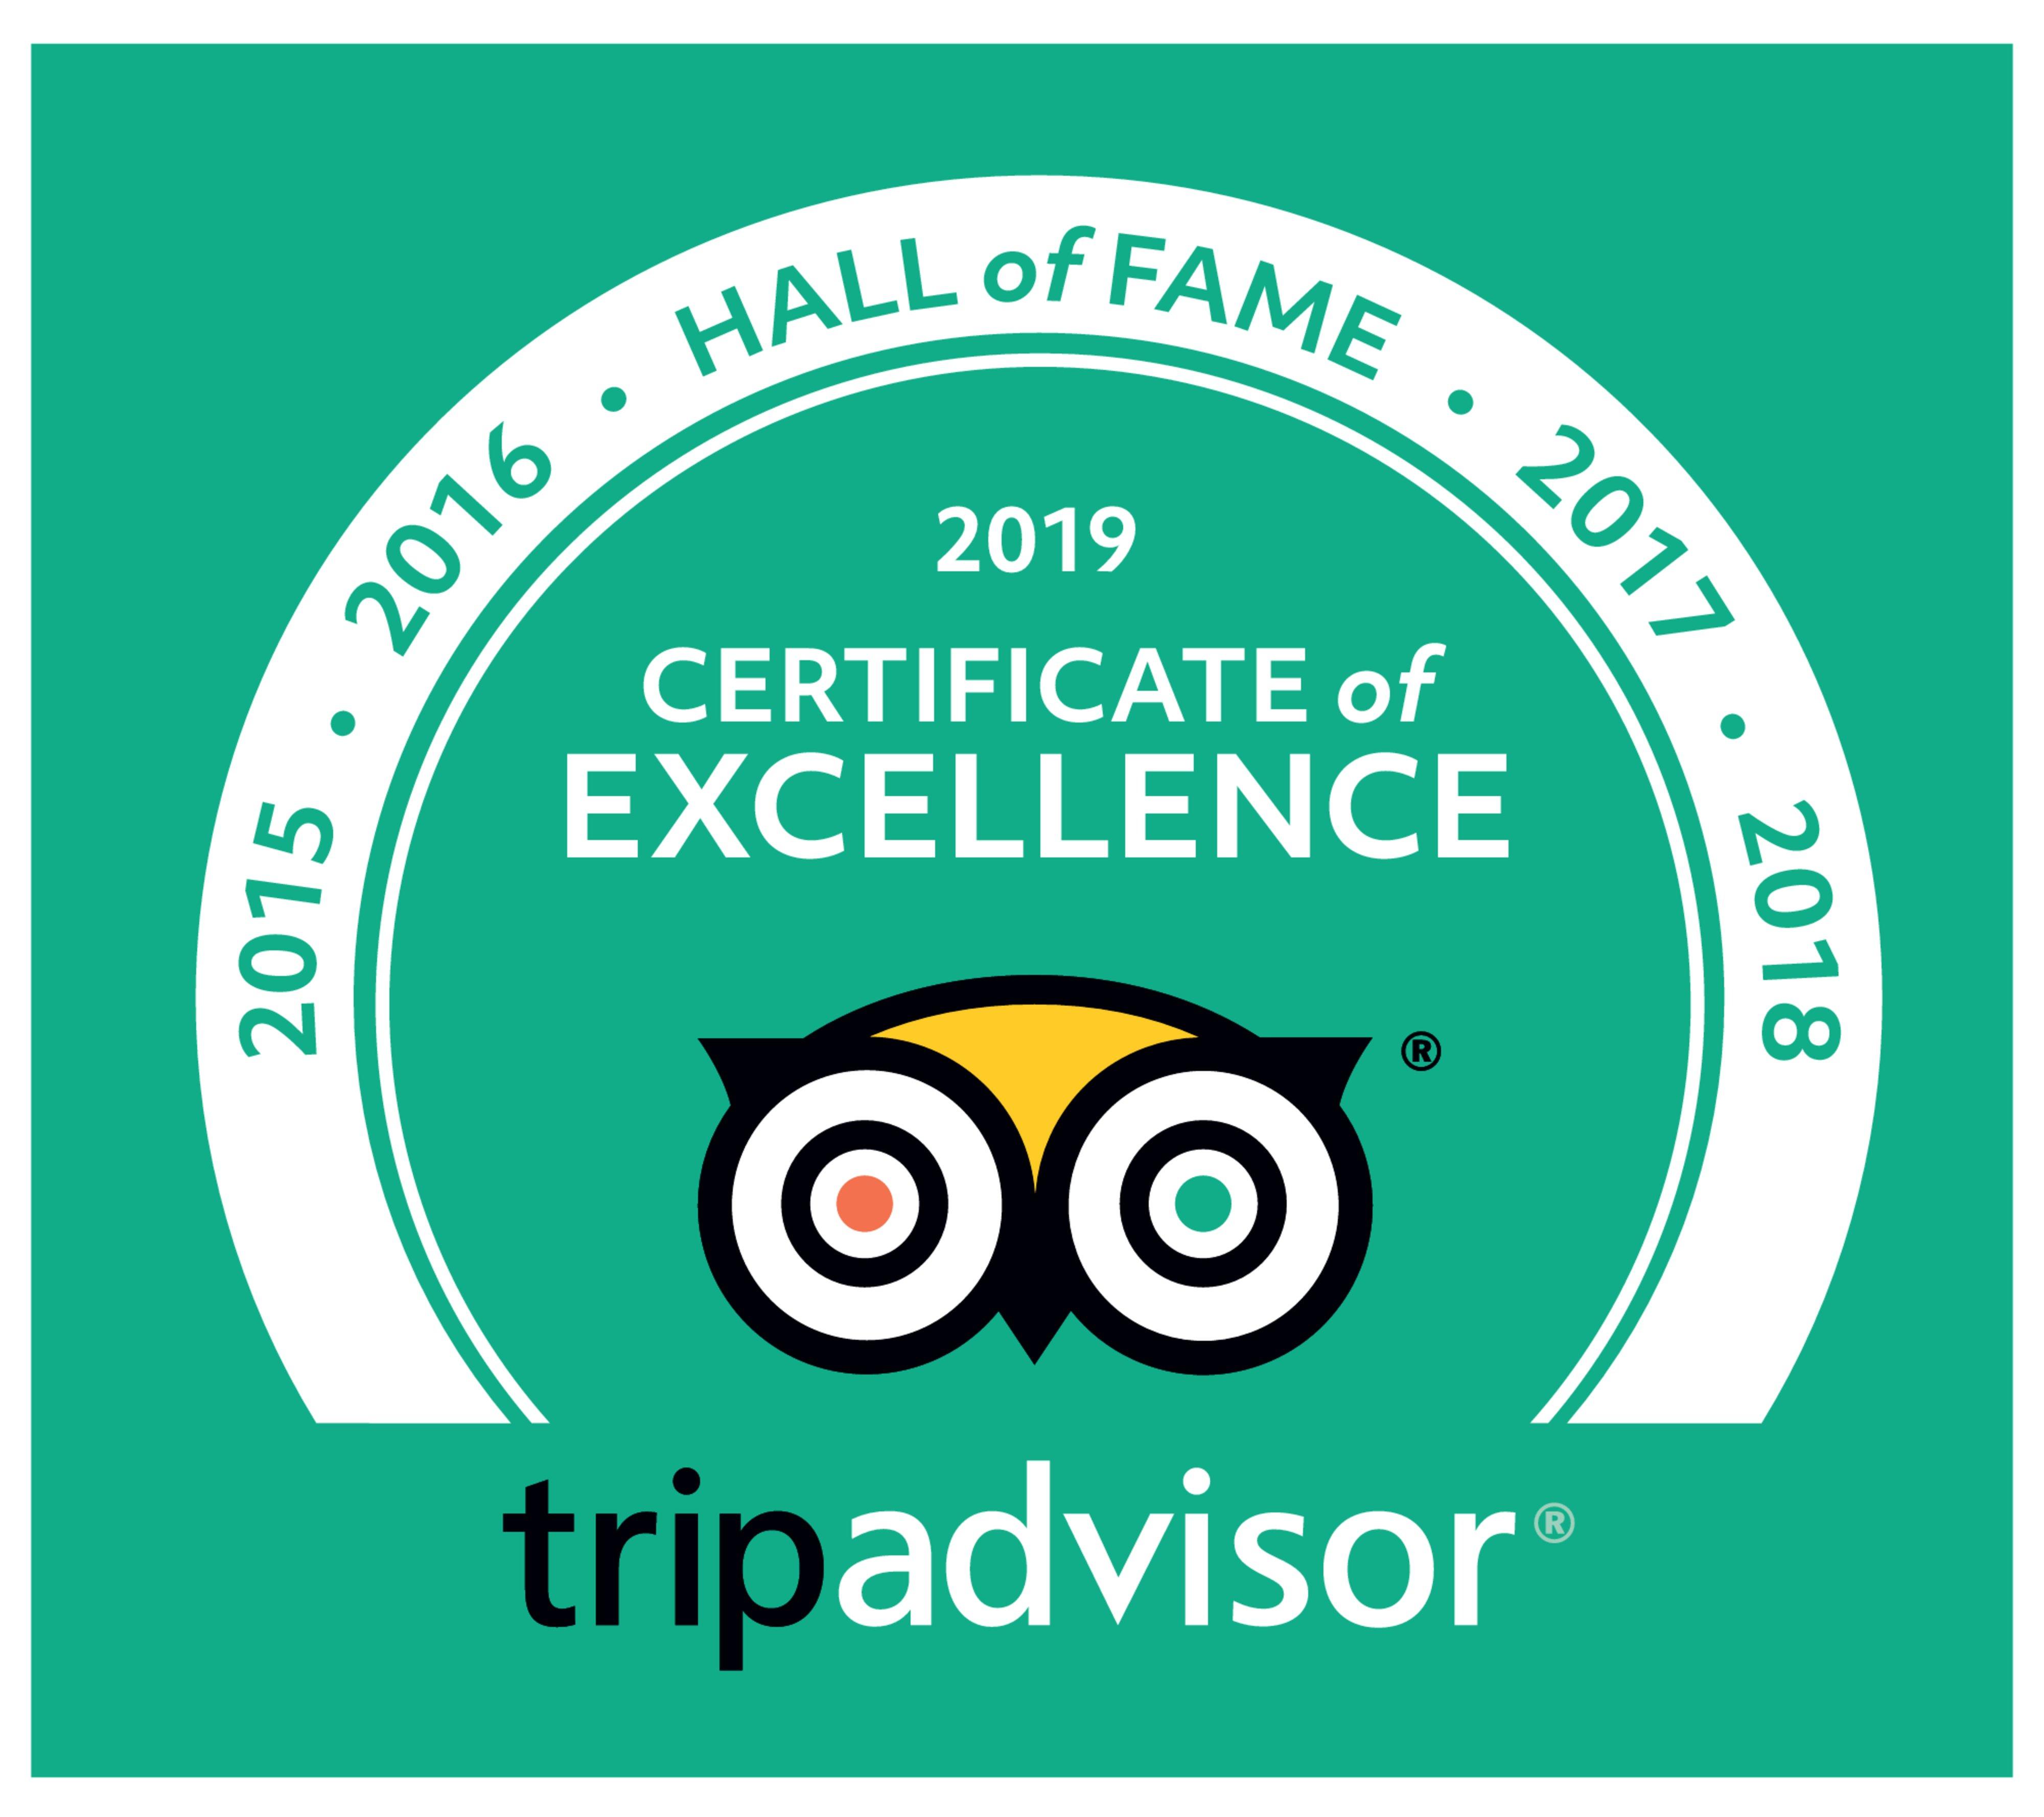 Tripadvisor - Hall of Fame